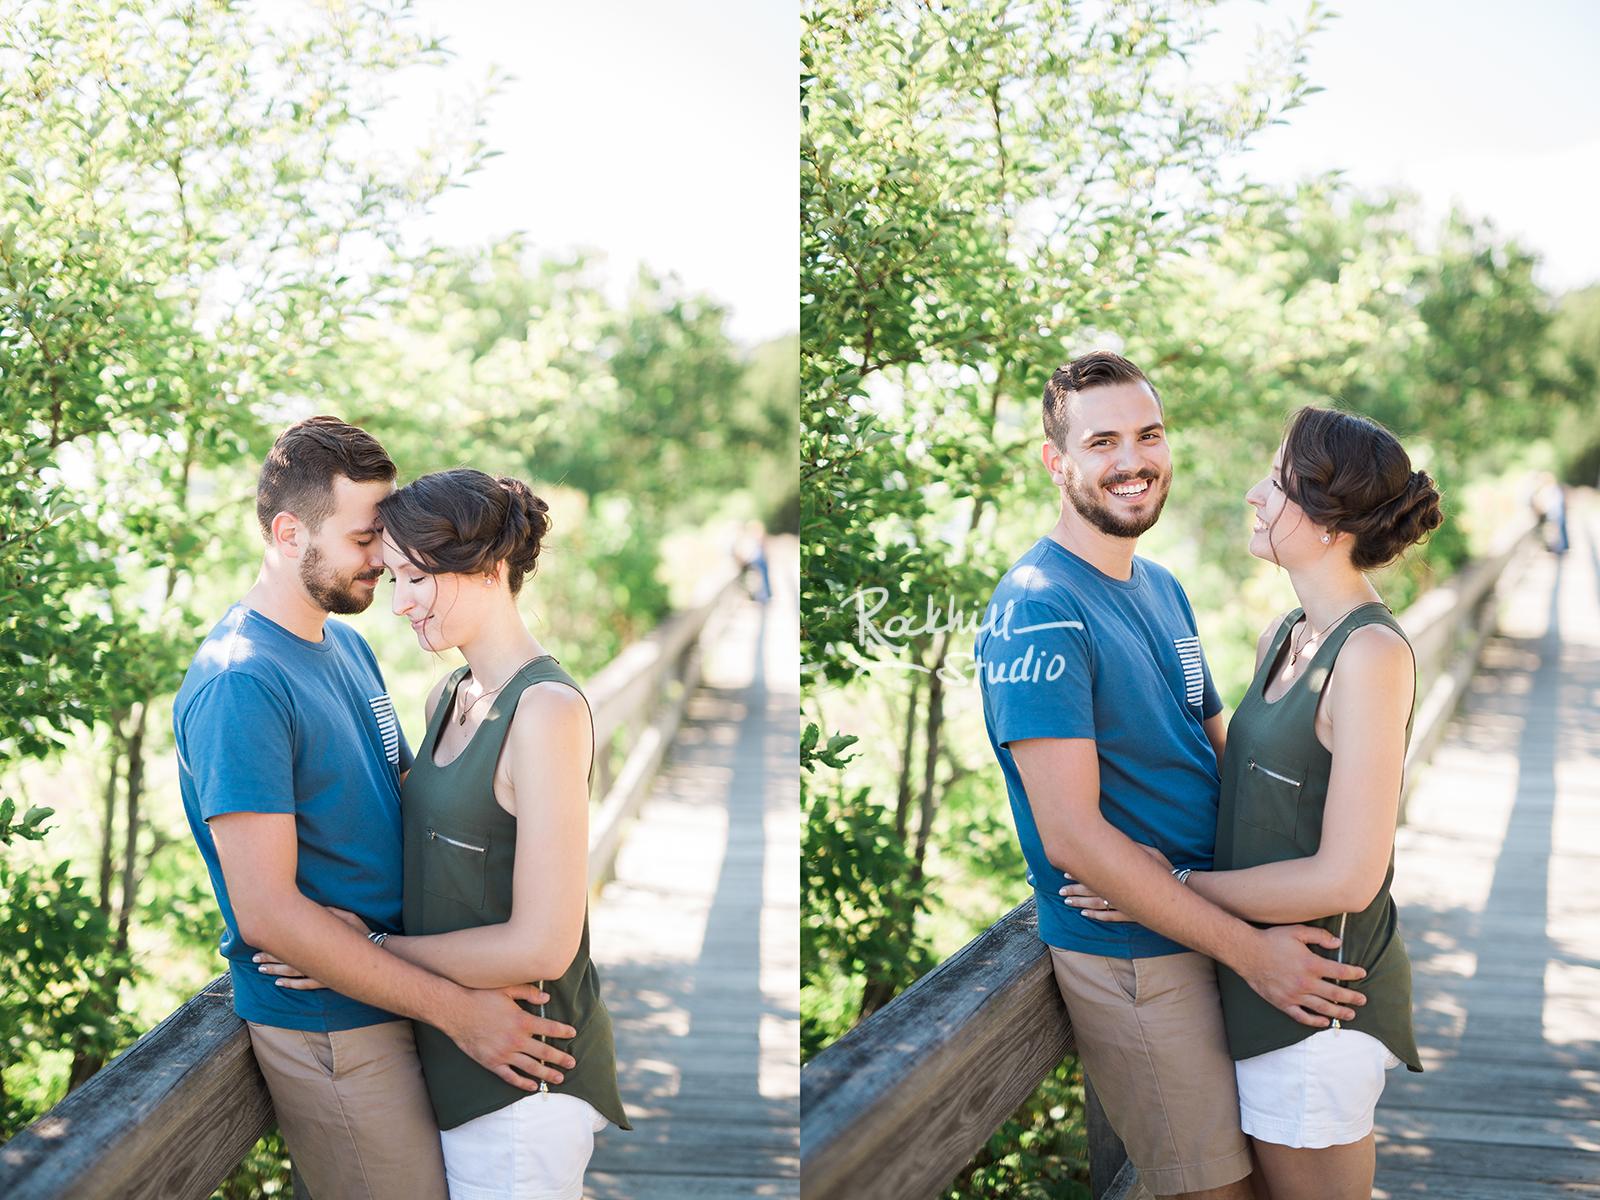 mackinac-island-wedding-engagement-northern-michigan-rockhill-studio-jt-5.jpg